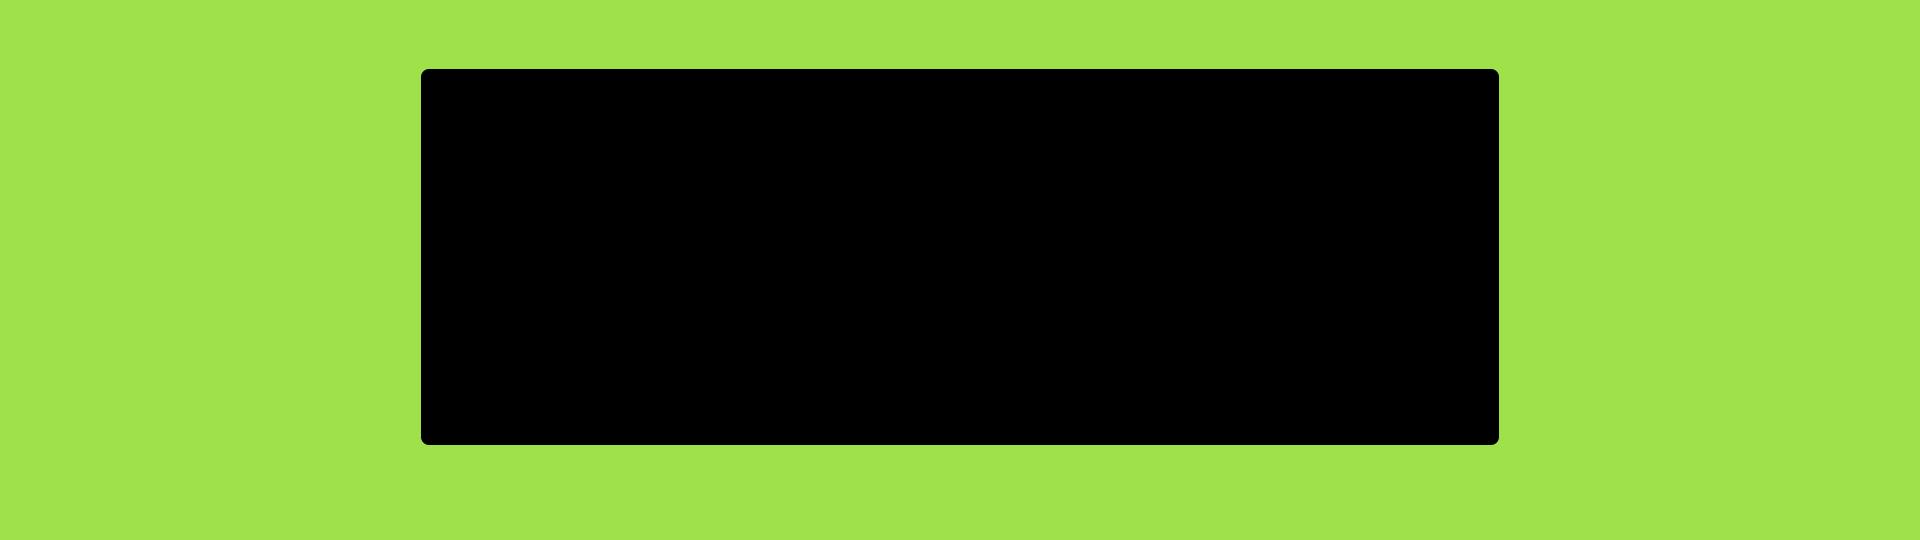 CATEGORY-PETSHP-KACIRILMAYACAKINDIRIM-20-02